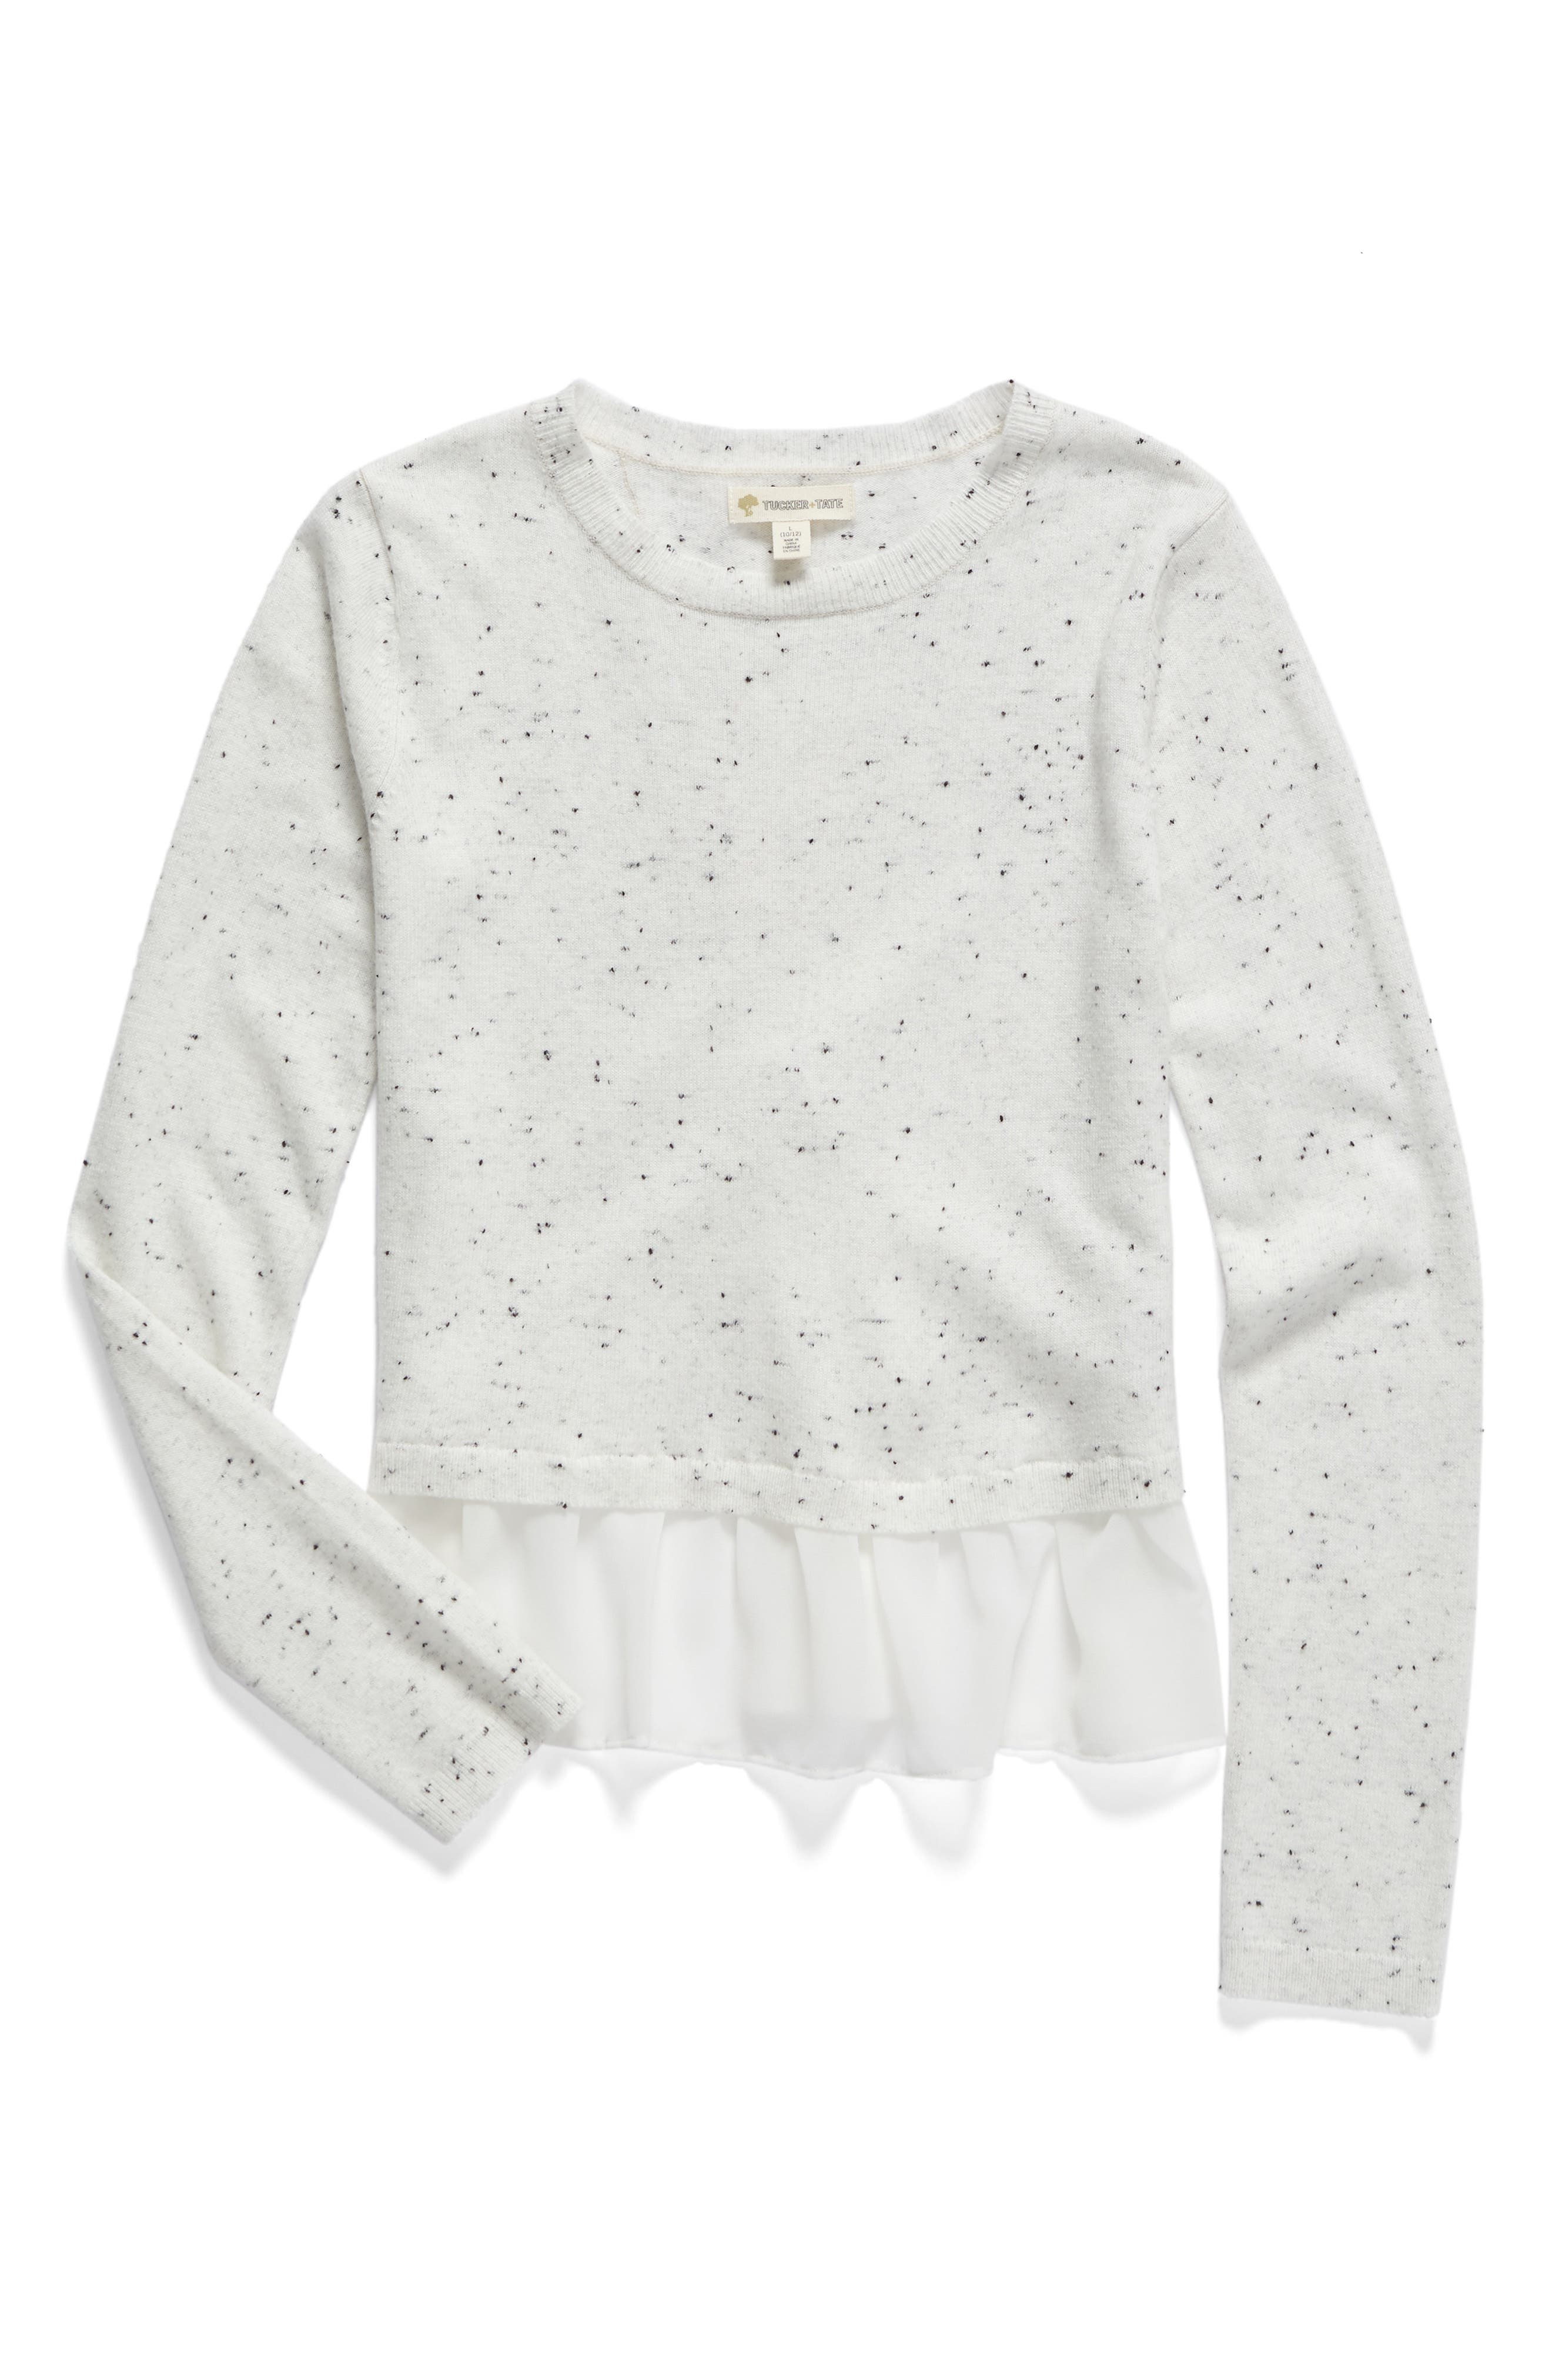 Mixed Media Crossover Sweater,                             Main thumbnail 1, color,                             900